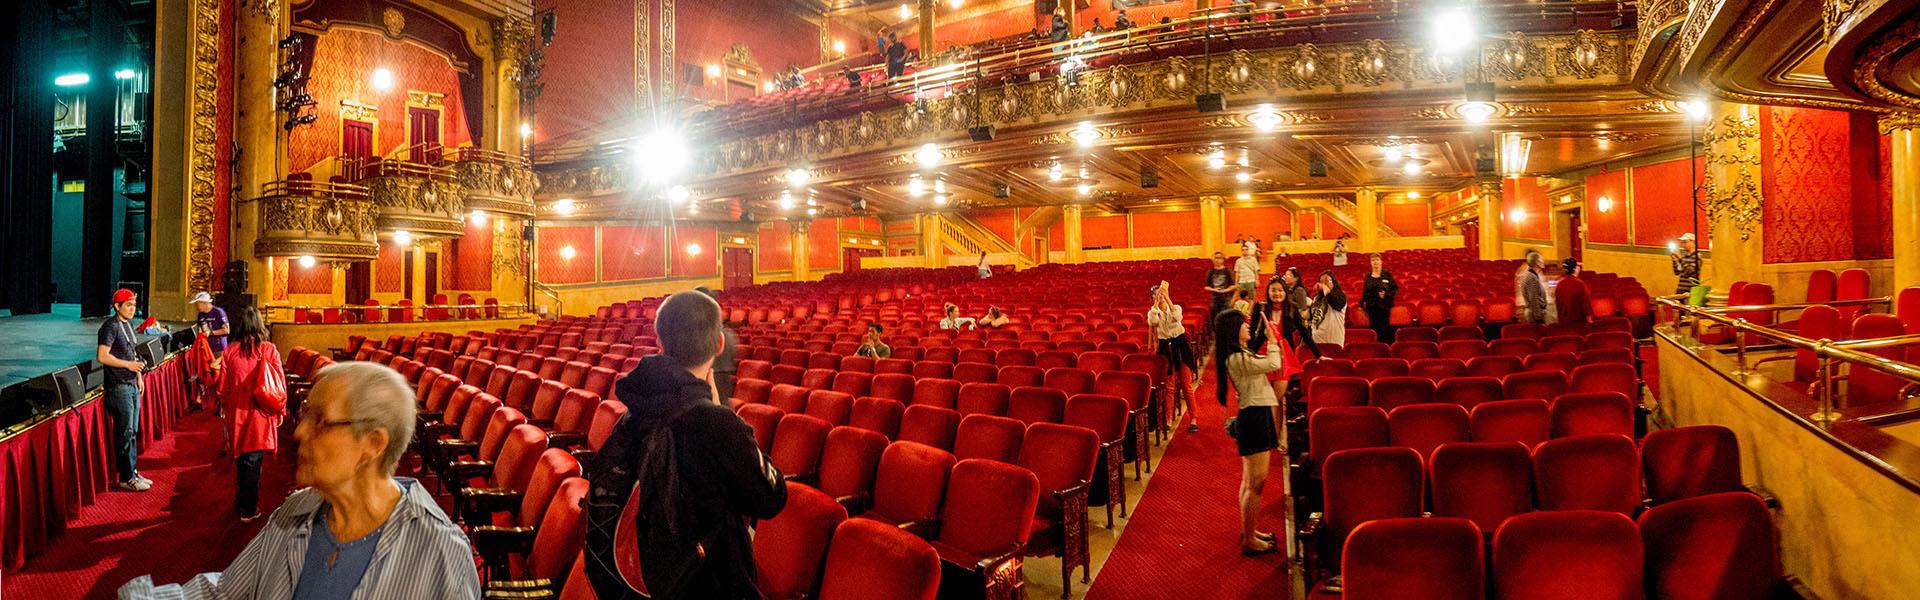 Visite du théâtre Elgin